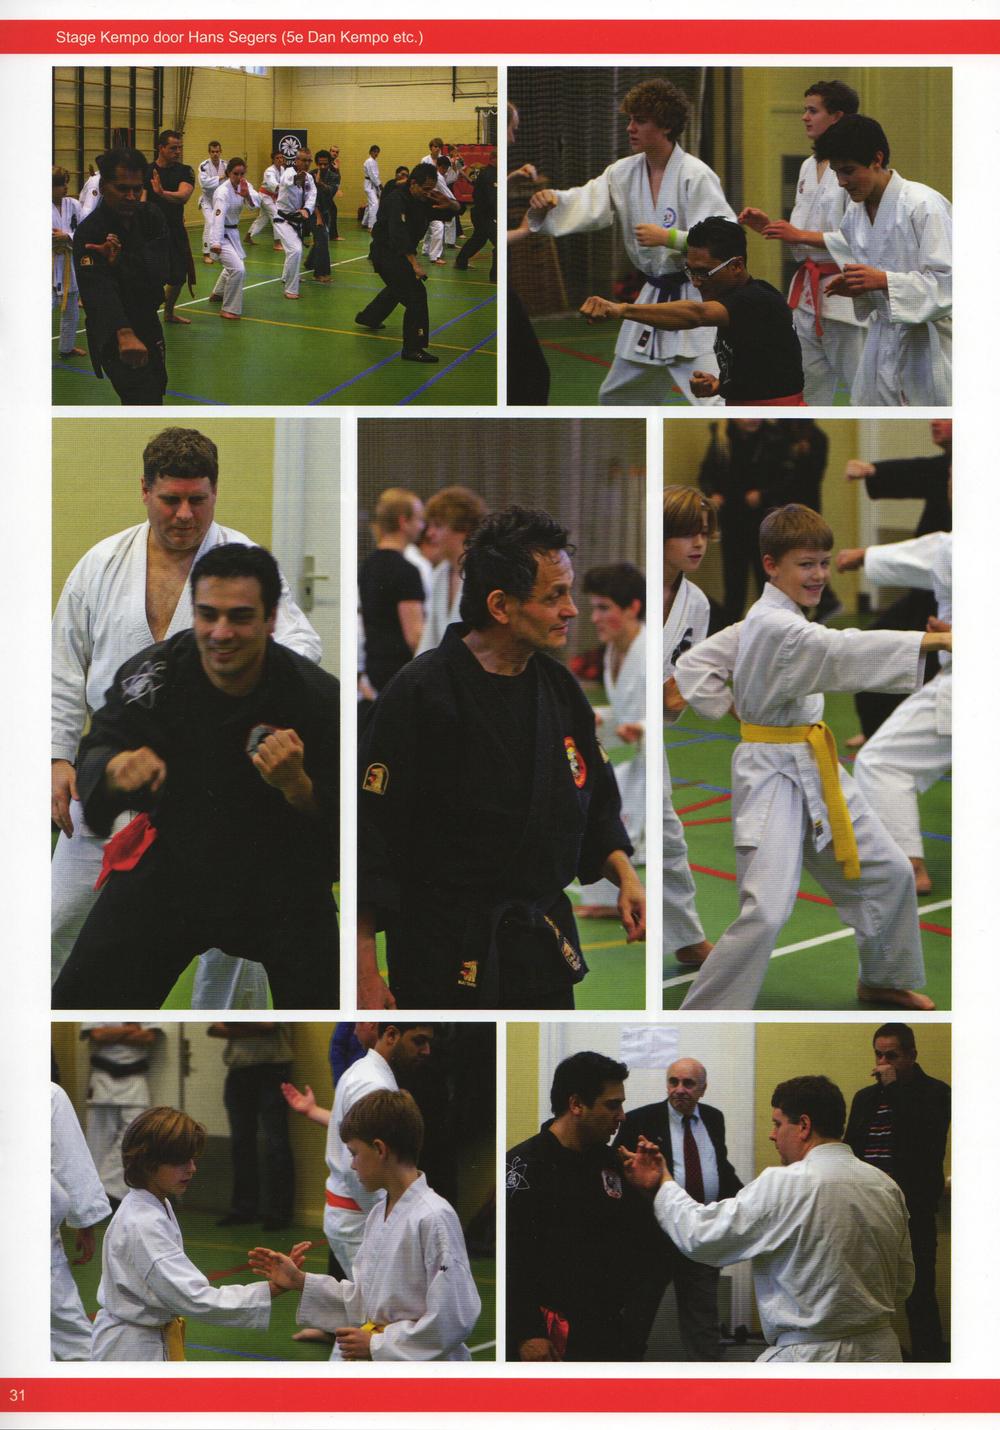 2012-11-04 NFK 7 Masters Martial Arts Festival Fotomagazine 2012 Pagina 31.jpg